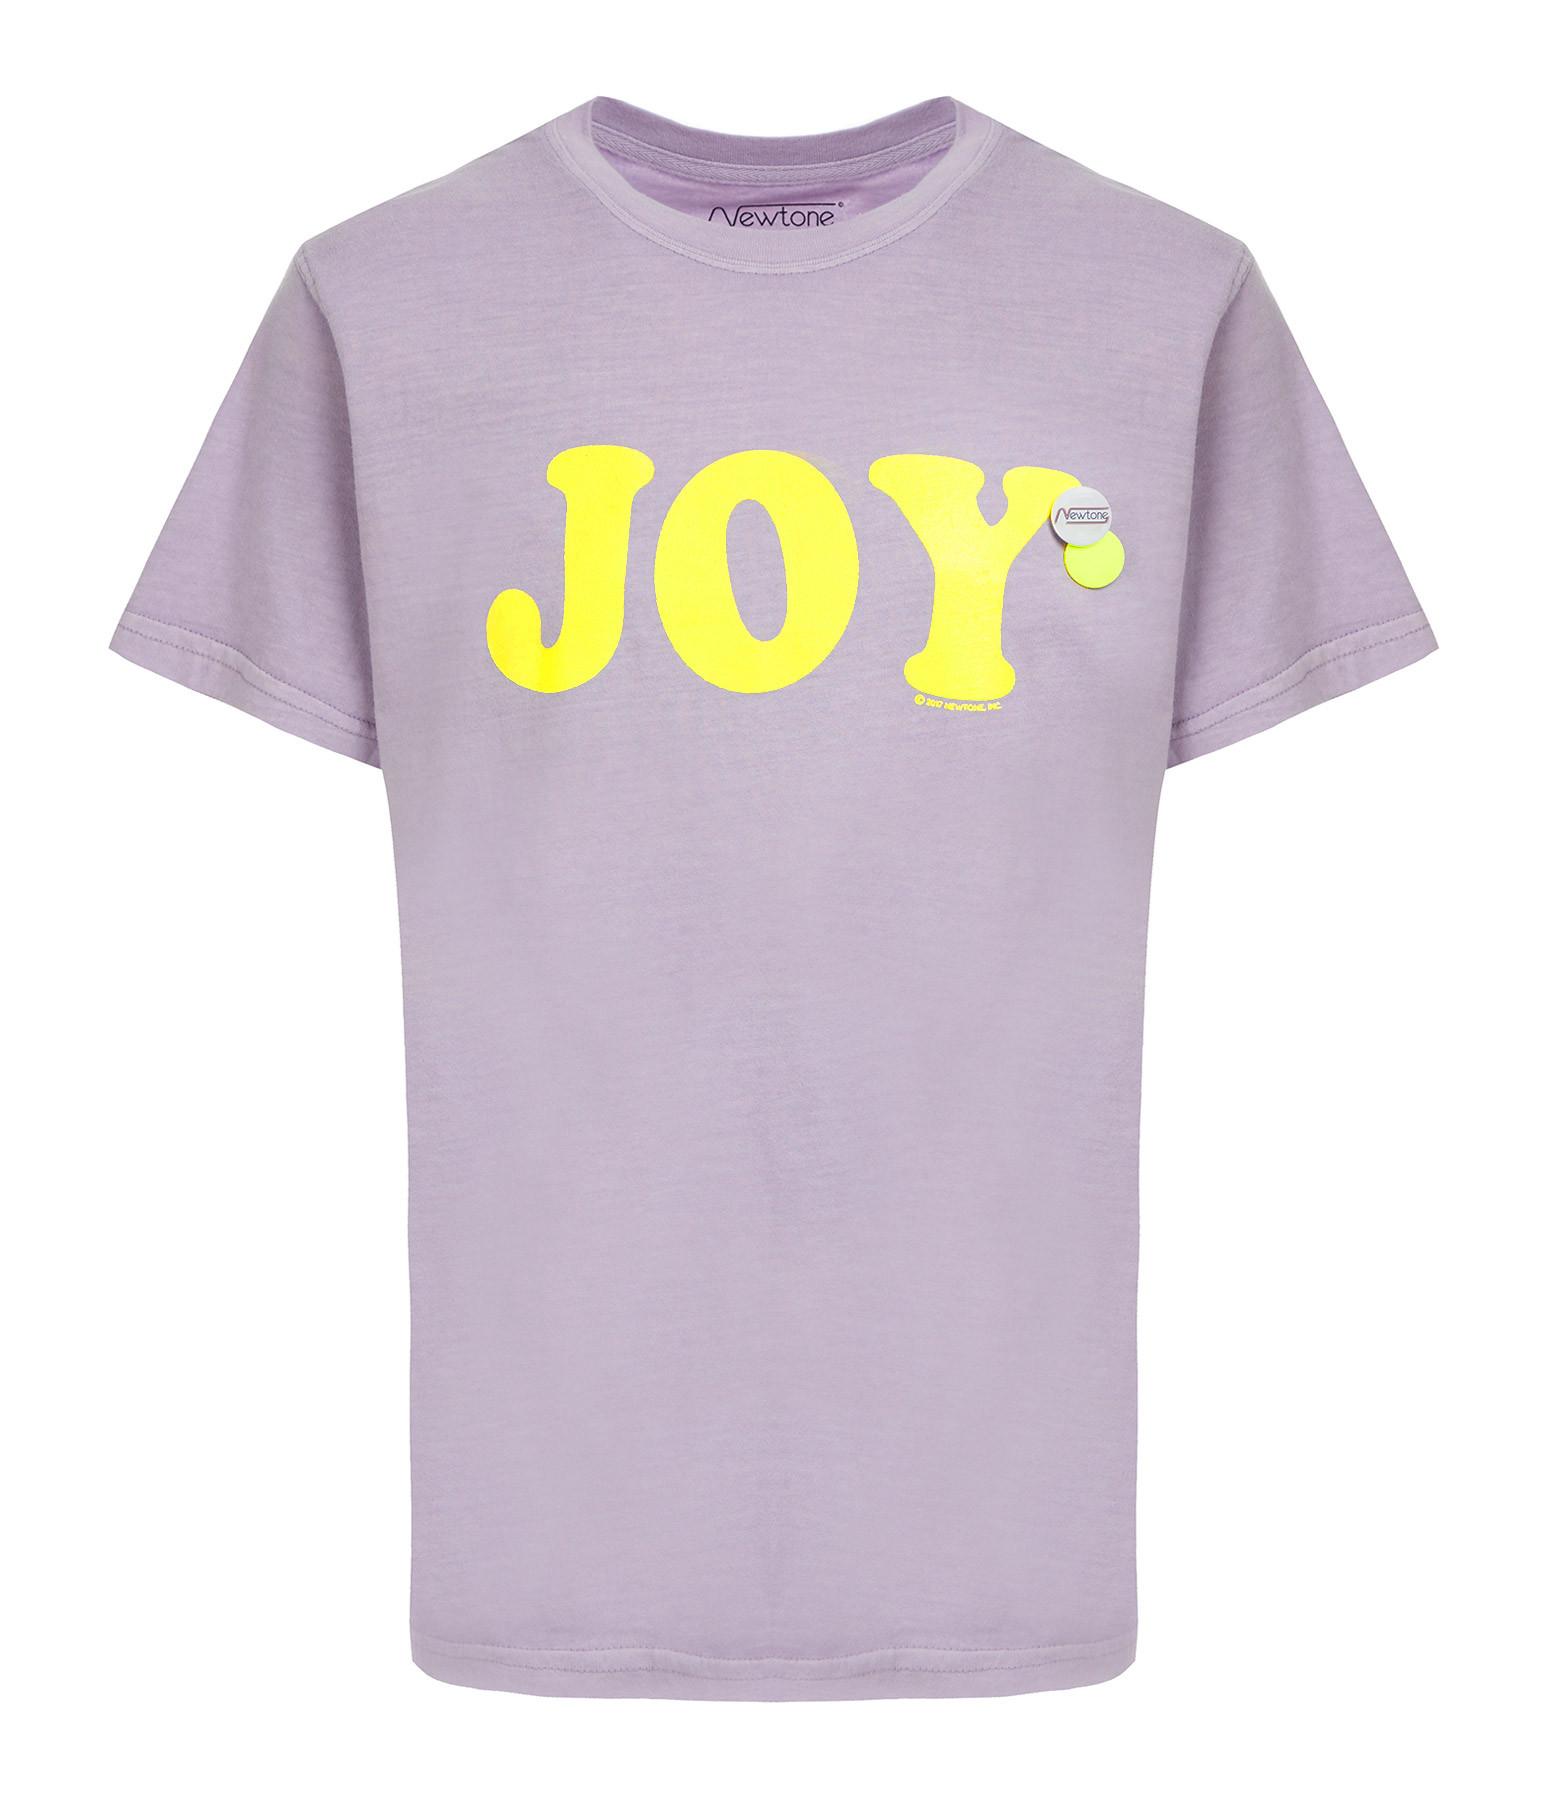 NEWTONE - Tee-shirt Trucker Joy Coton Lilac